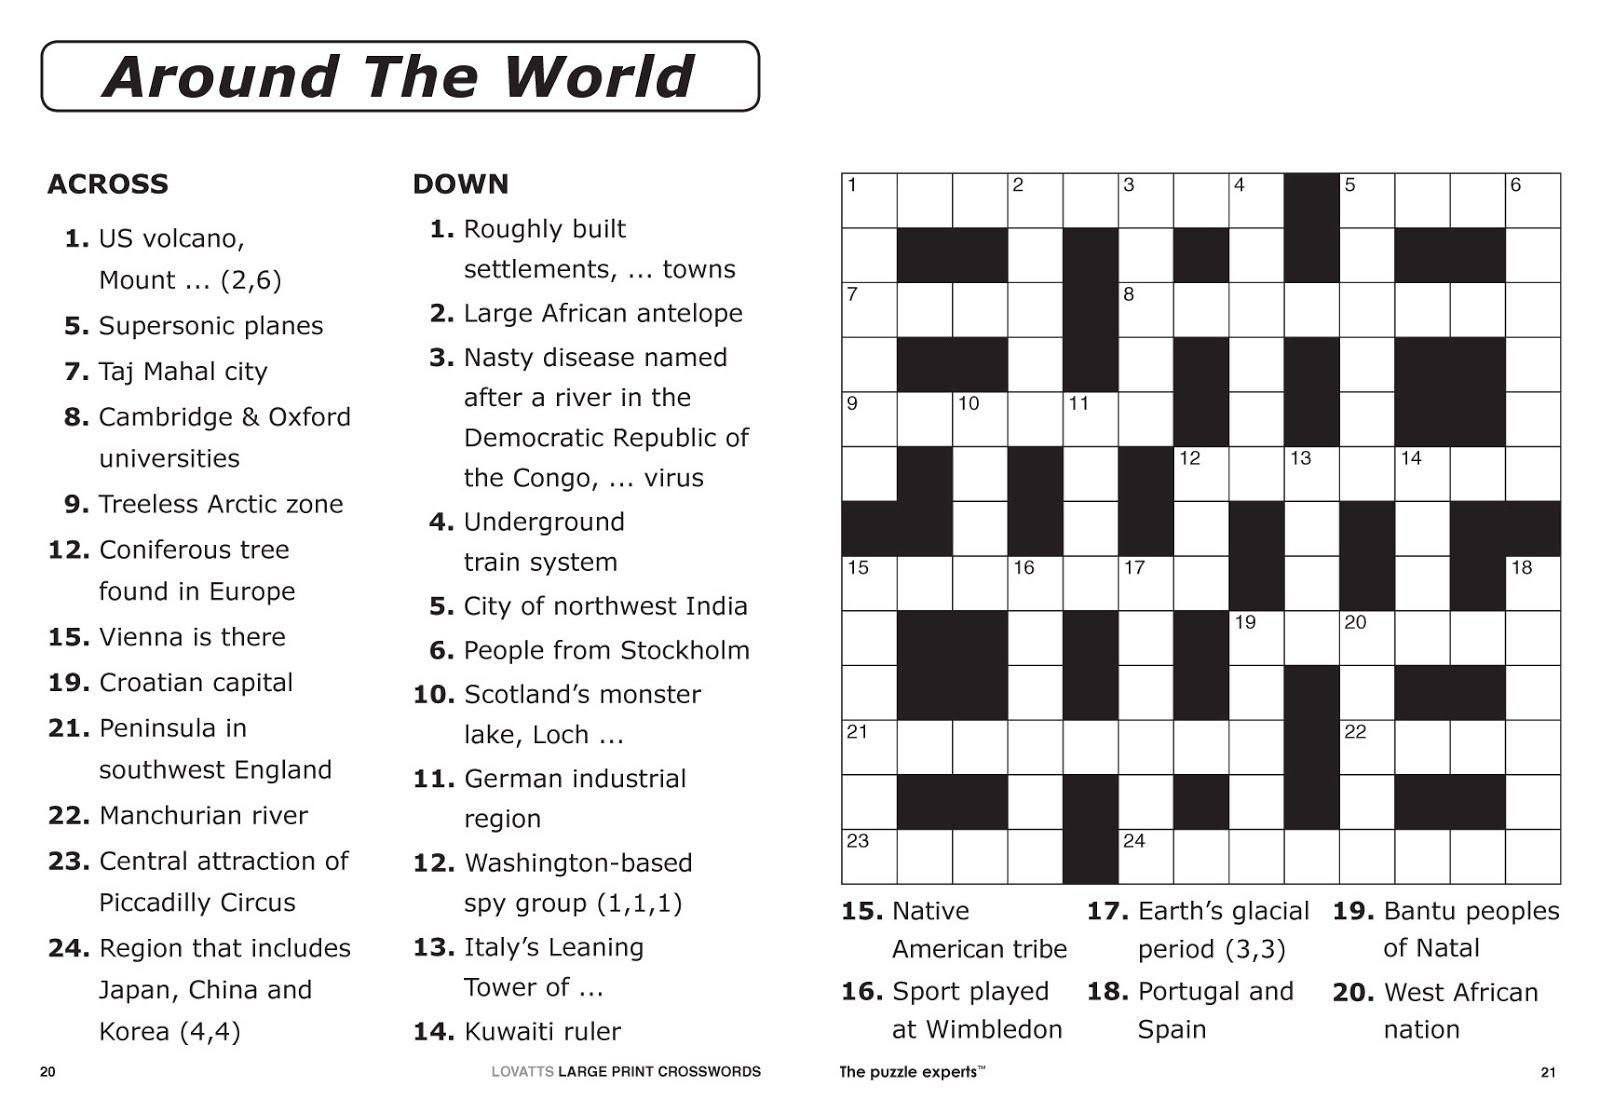 Easy Printable Crossword Puzzles | Elder Care & Dementia Care - Free Printable Easy Crossword Puzzles For Seniors